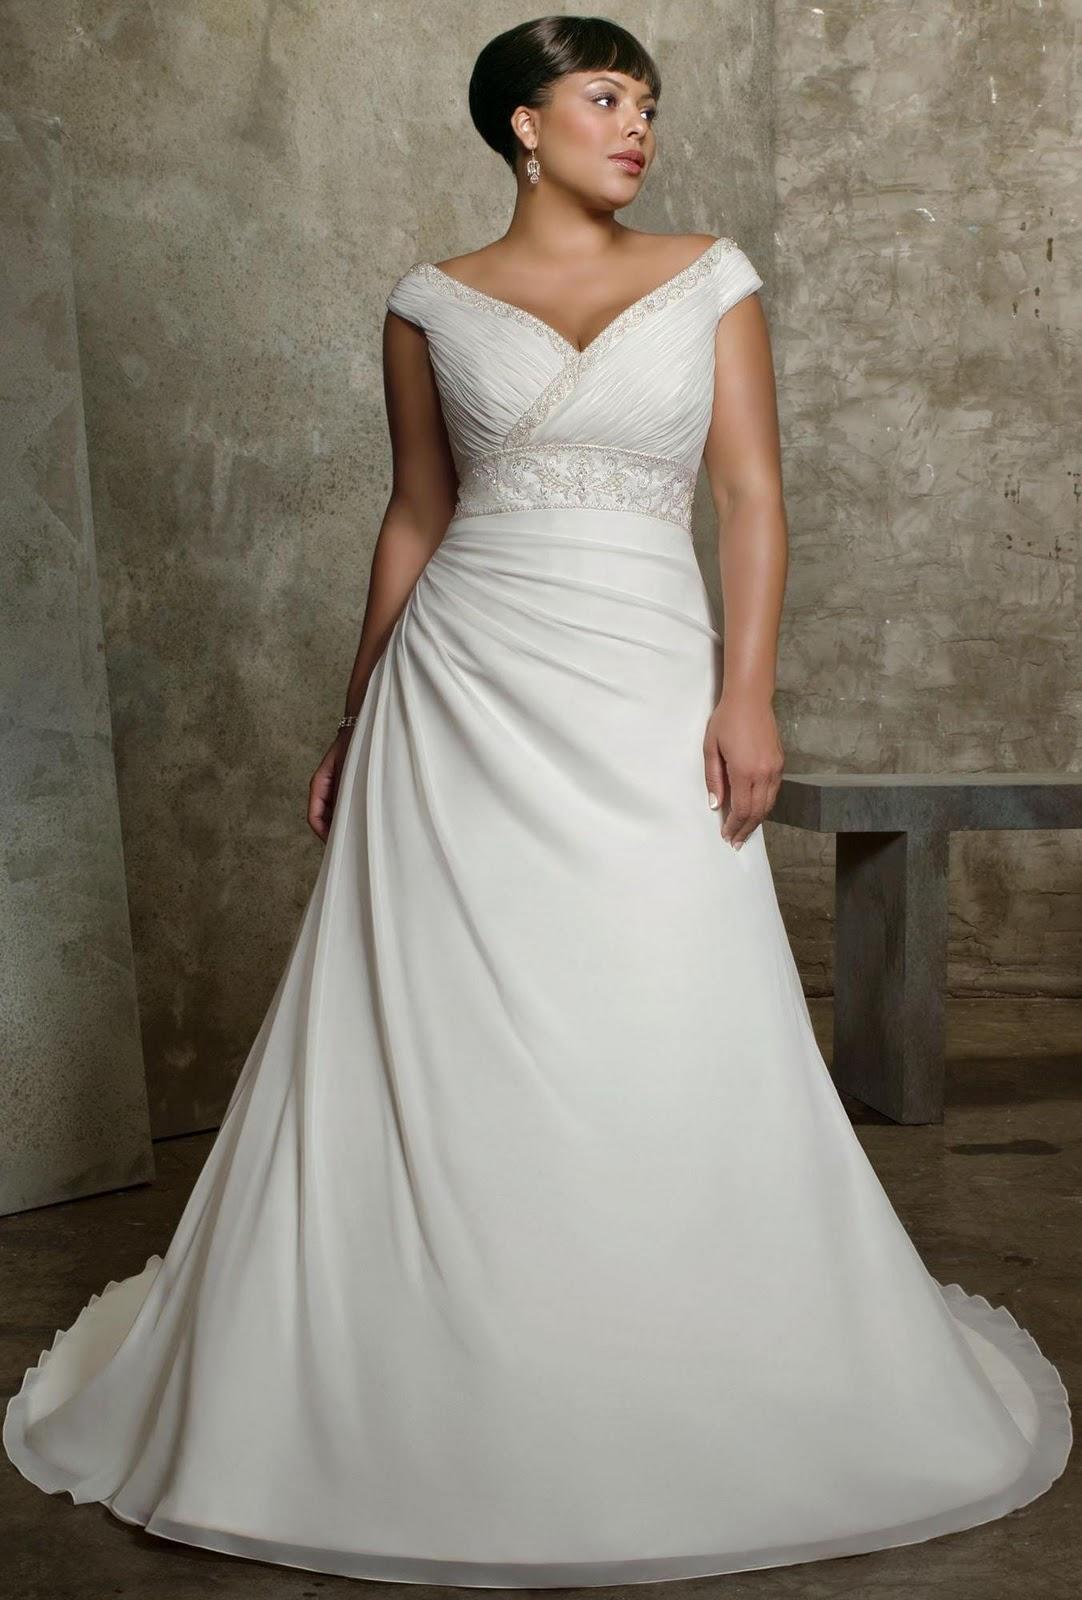 Waist A-Line Wedding Gown aw385 drop ship Winter One-Piece Elegant